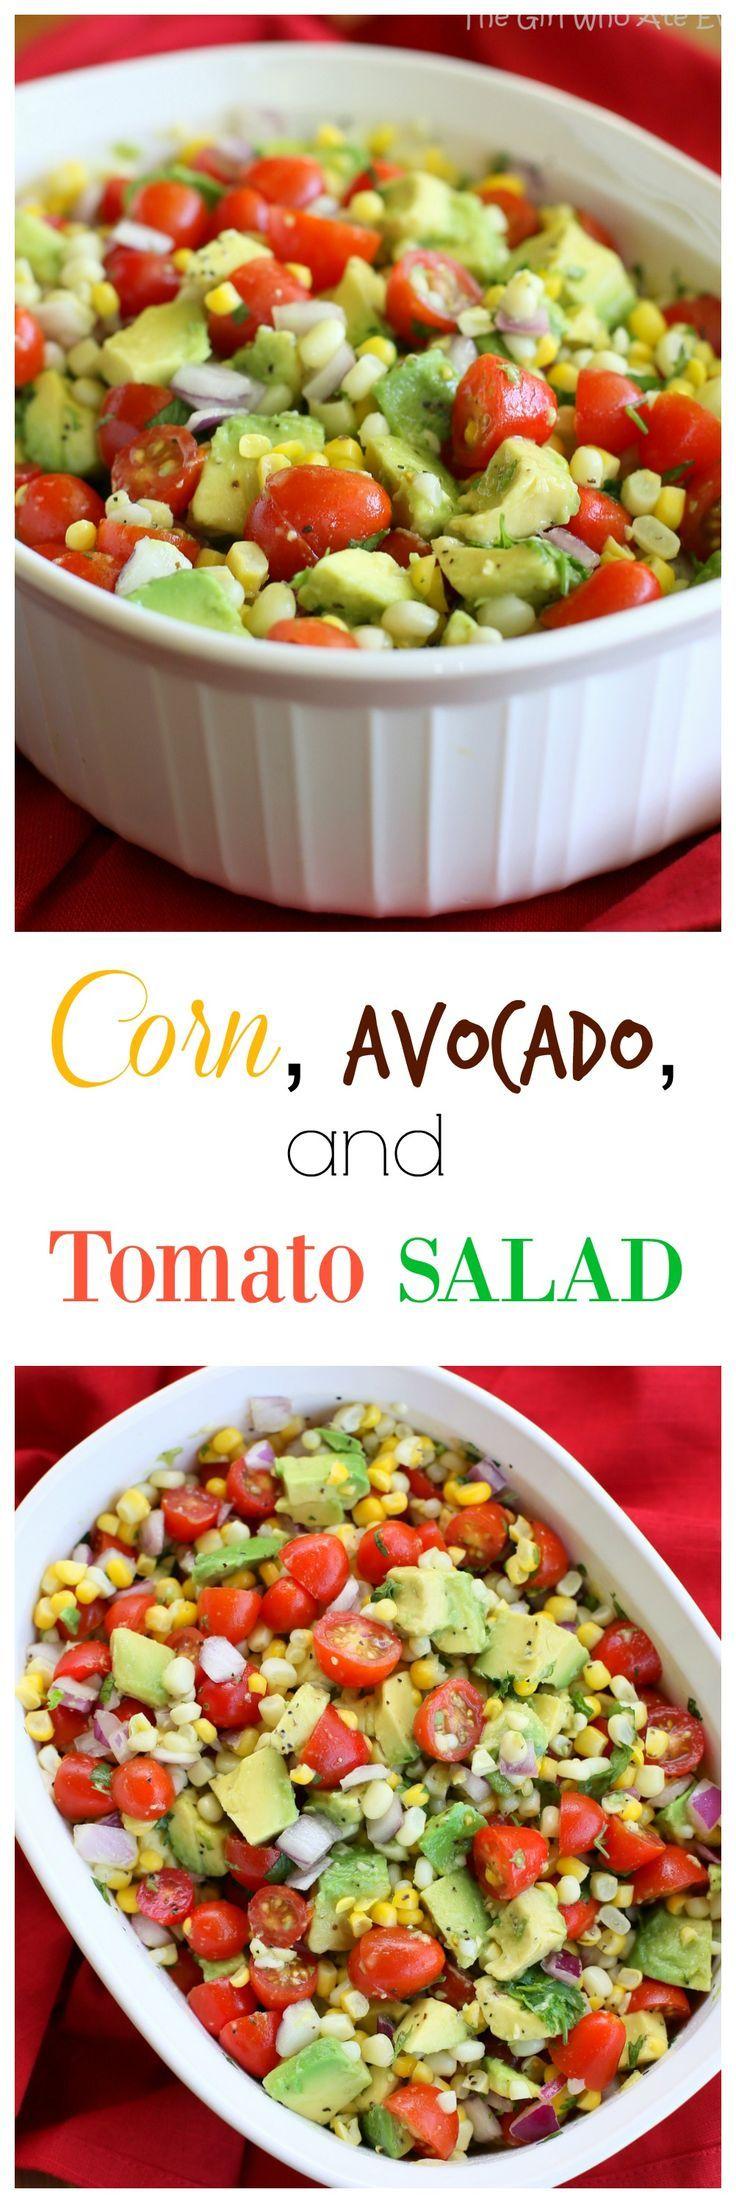 Corn Avocado and Tomato Salad   The Girl Who Ate Everything